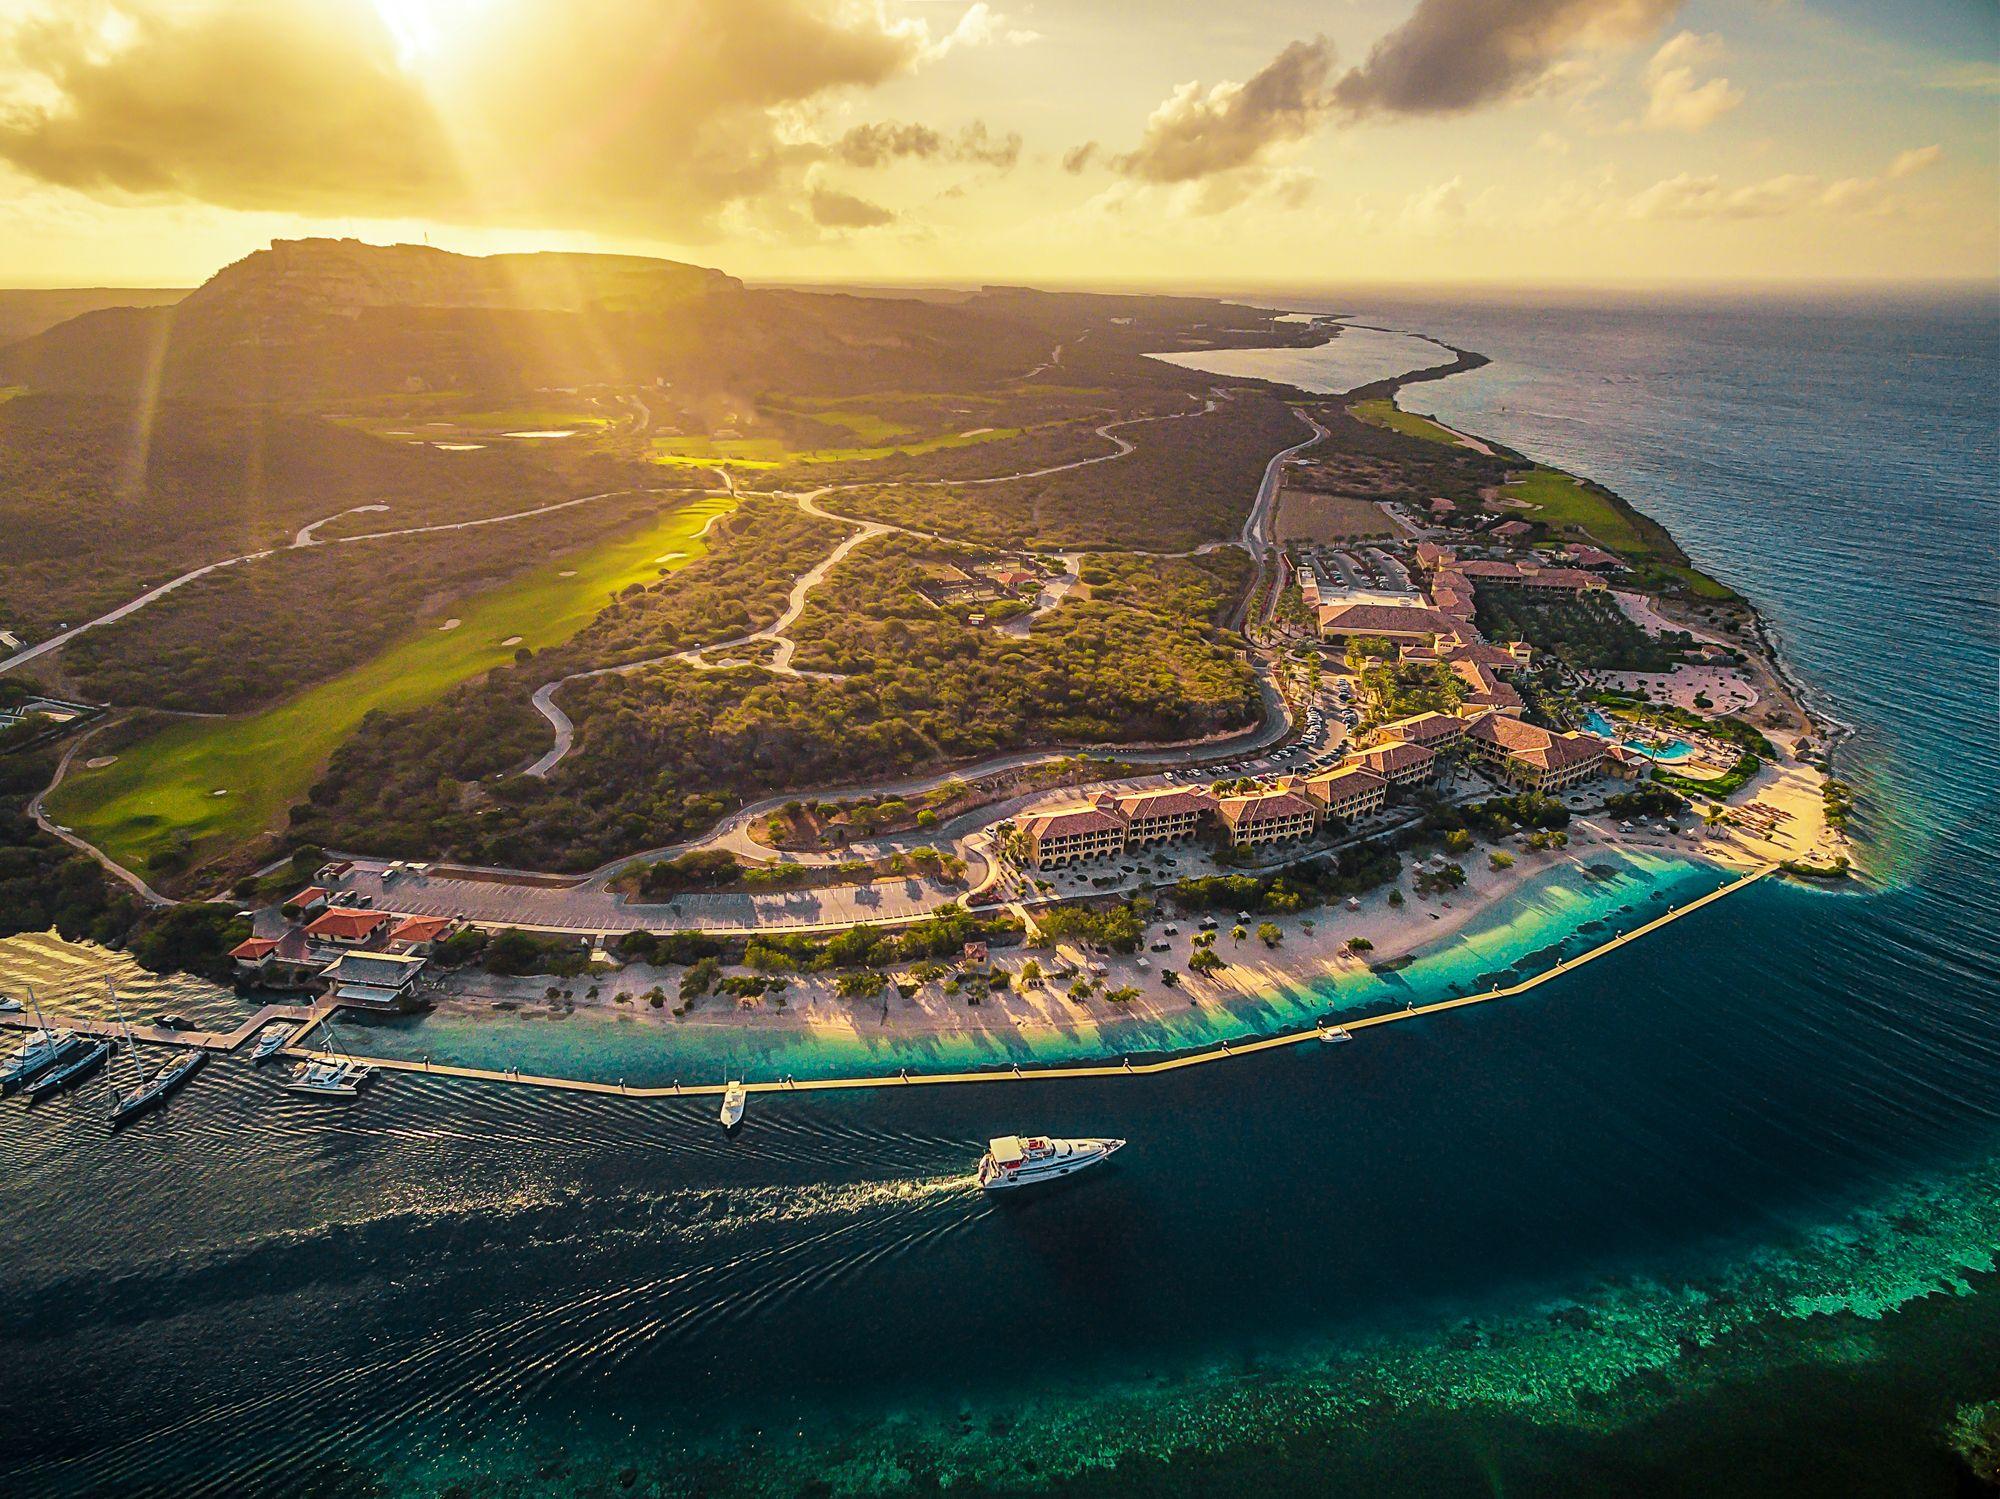 Sandals Curacao Resort Aerial